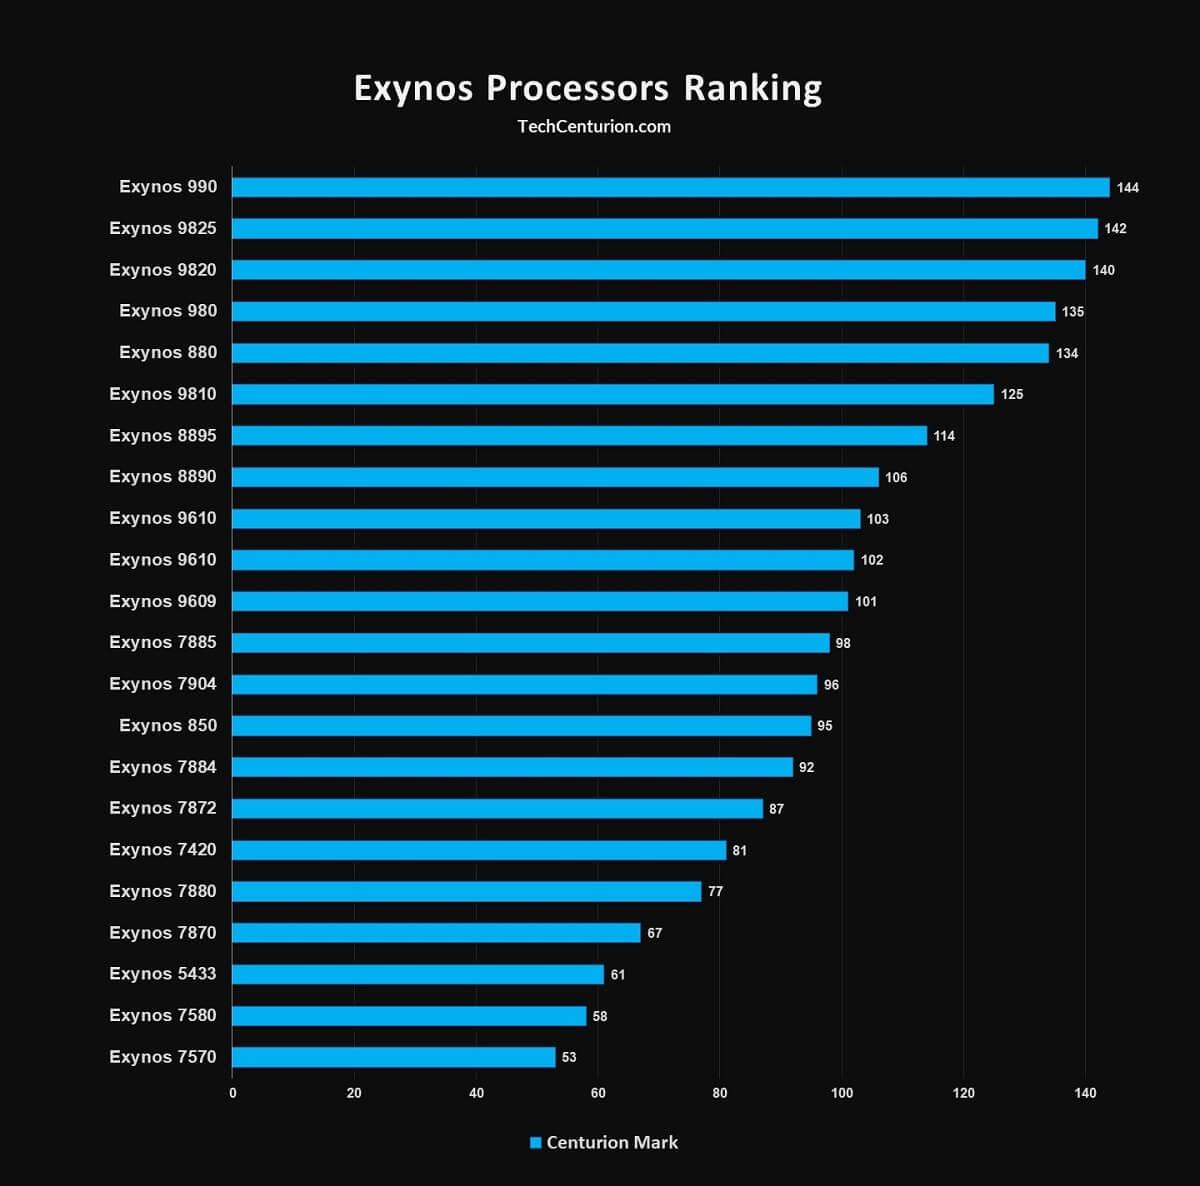 Exynos Processors Ranking